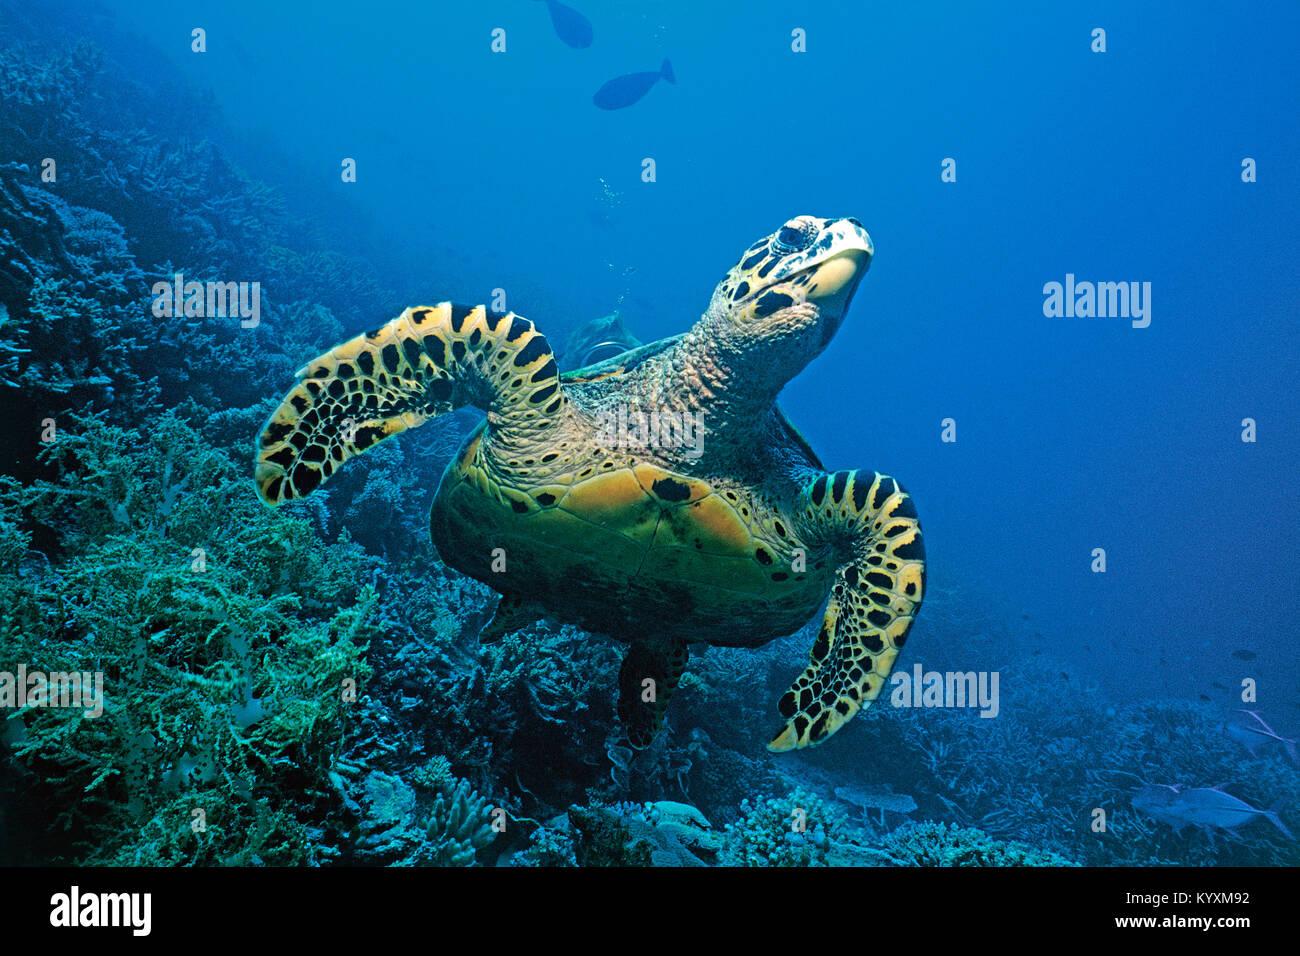 Hawksbill turtle (Eretmochelys imbricata), Maldives islands, Indian ocean, Asia - Stock Image